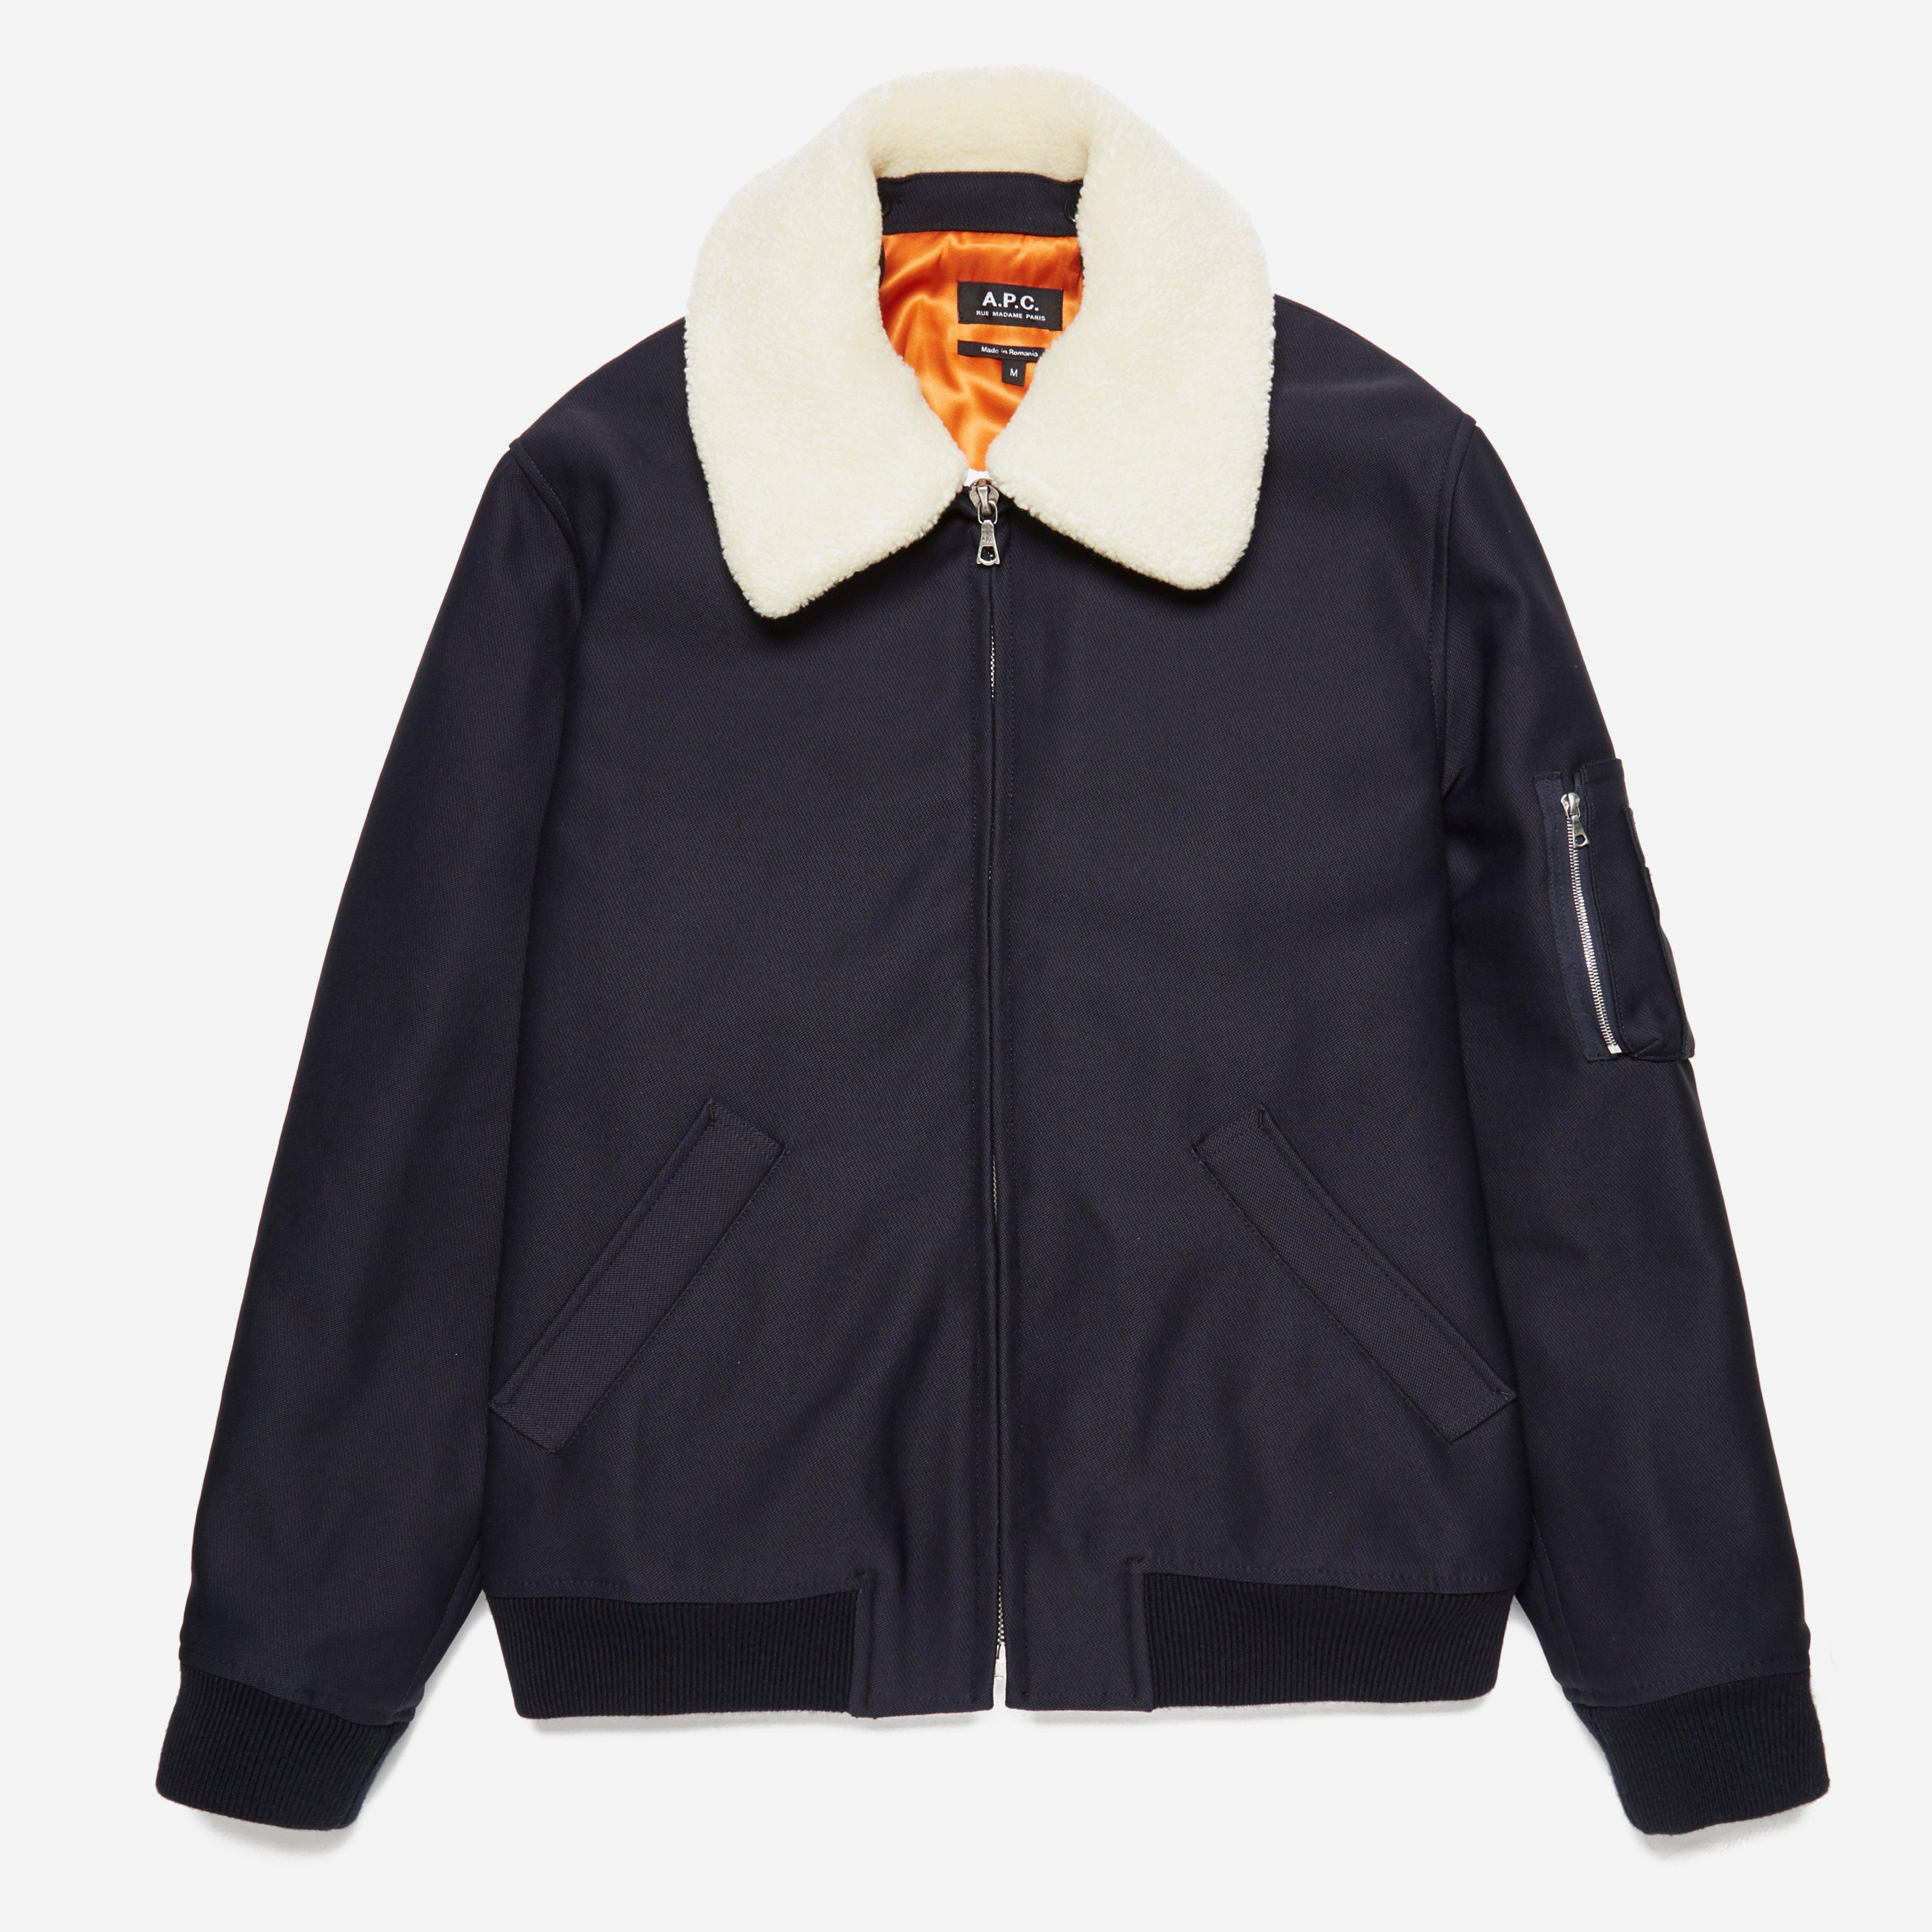 A.P.C Manchester Jacket